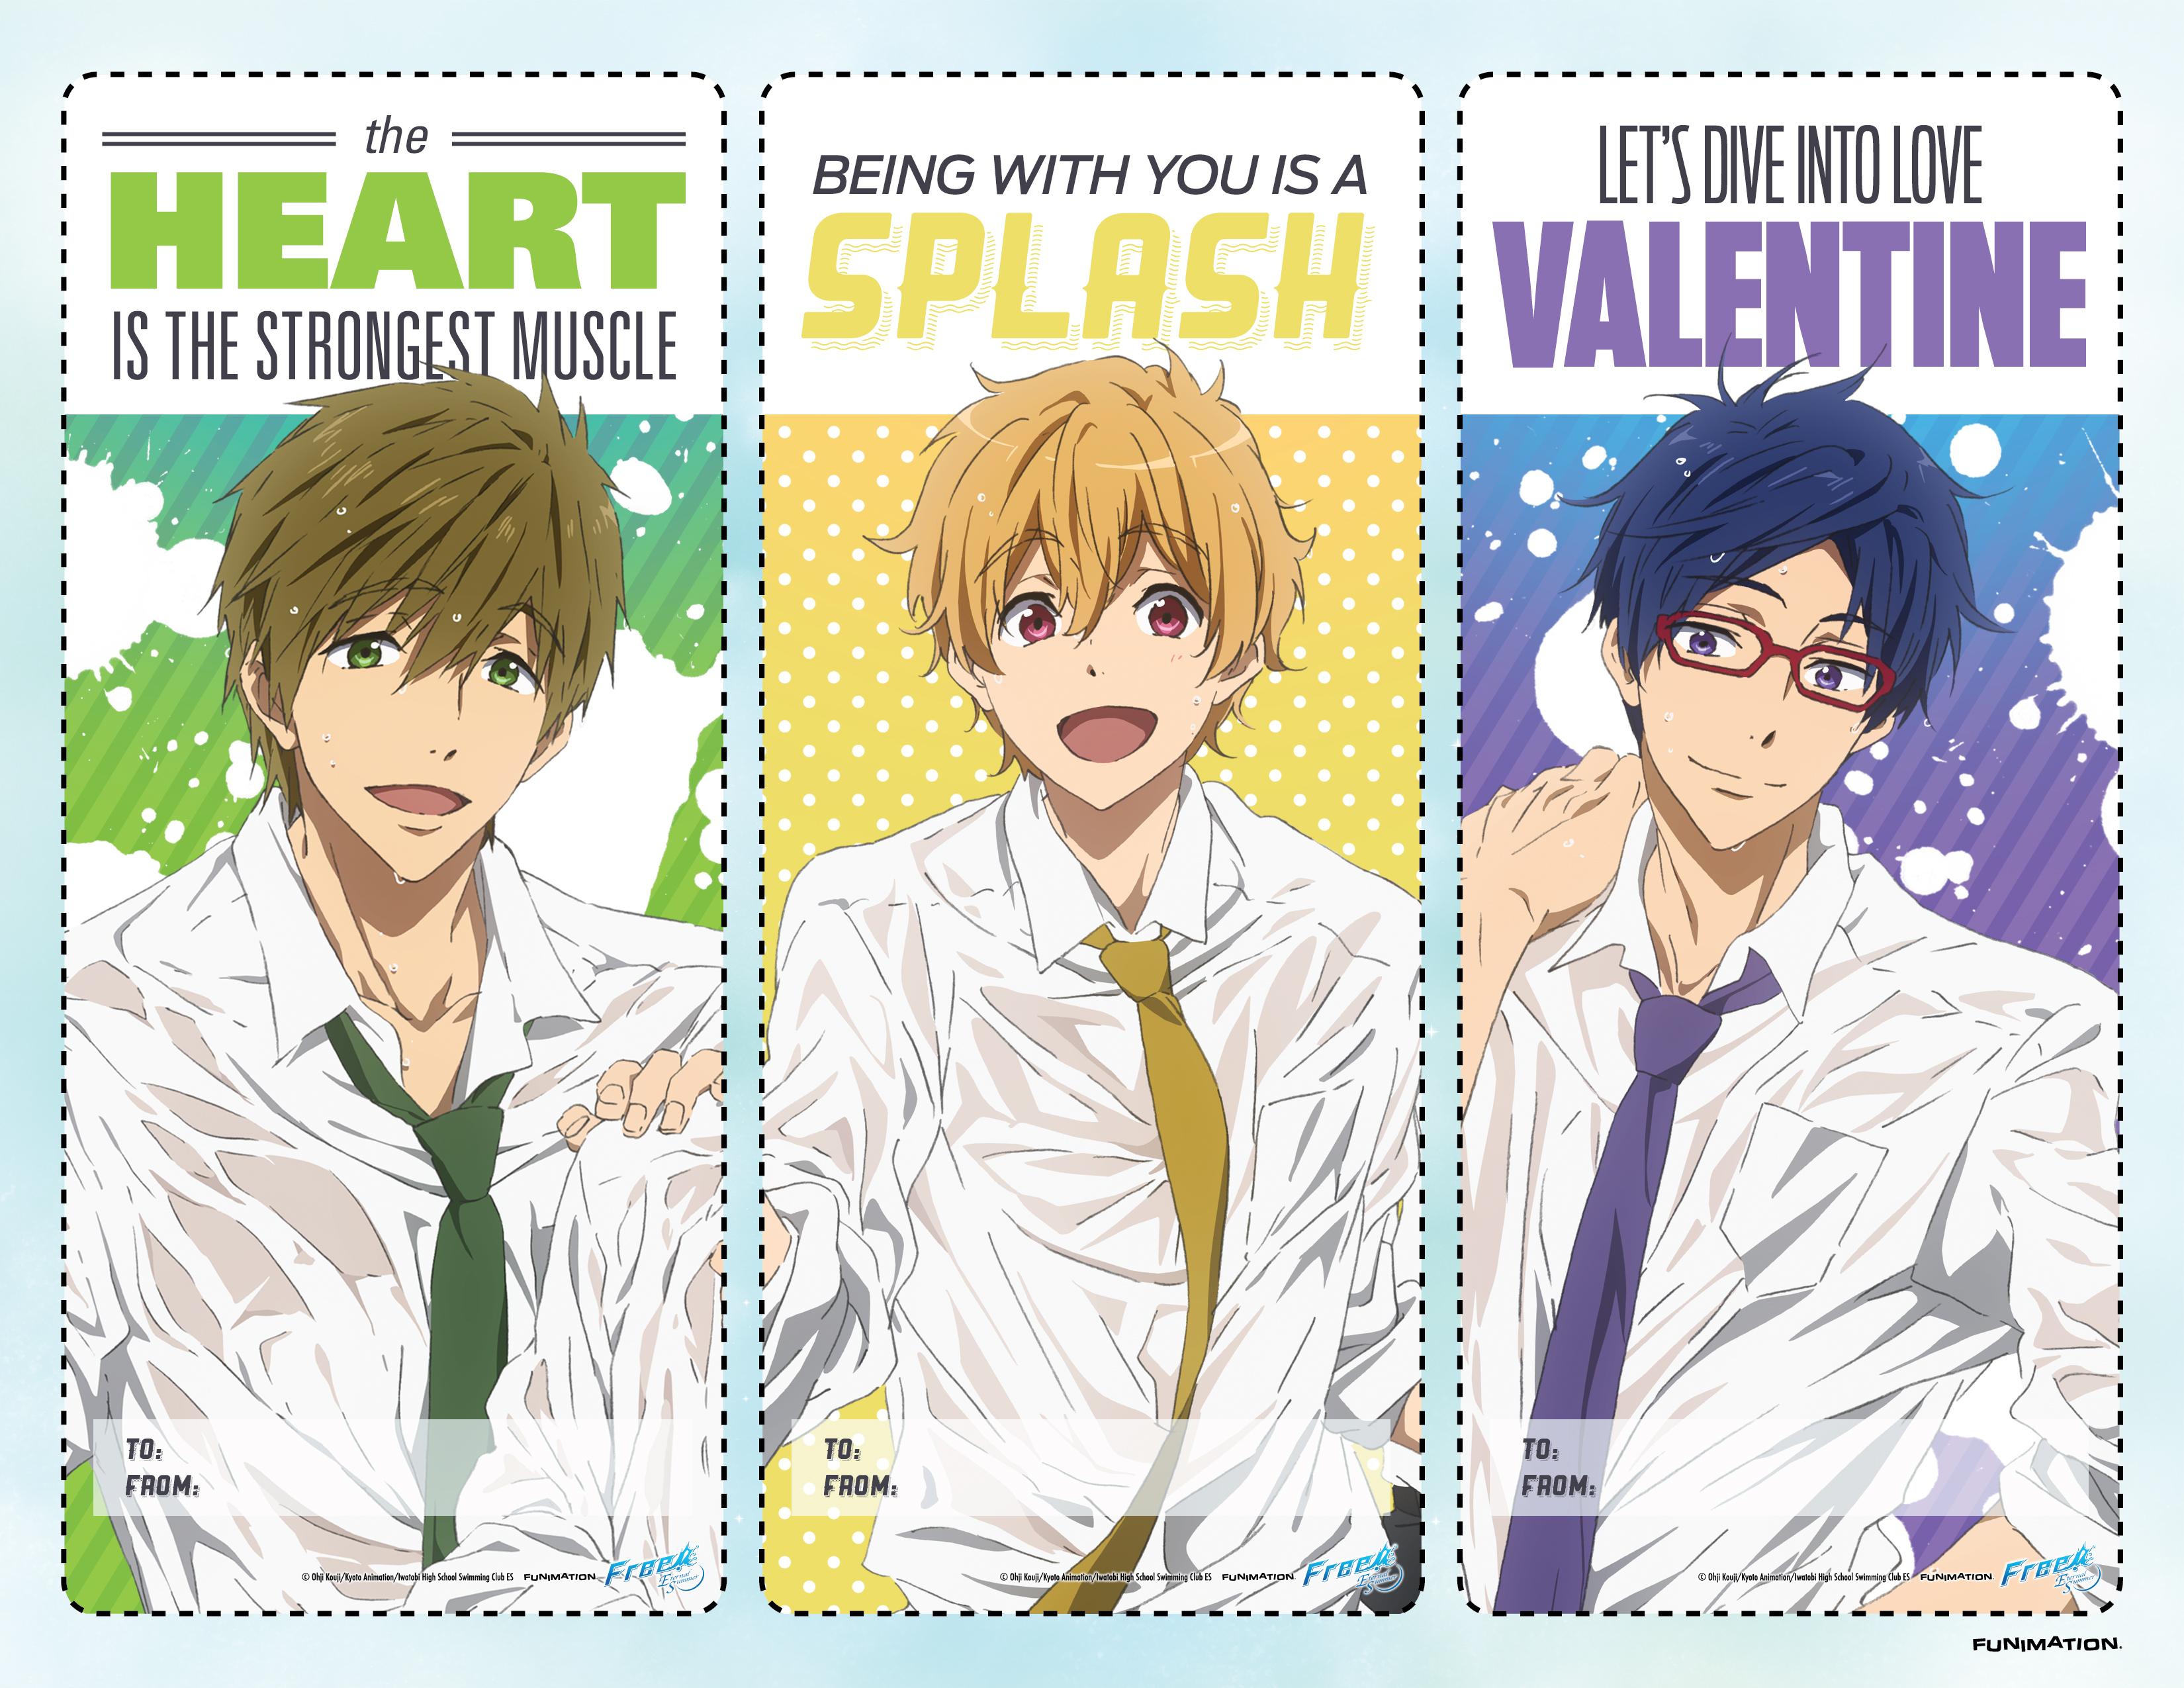 Anime Valentine's Day Cards haruhichan.com Free eternal summer